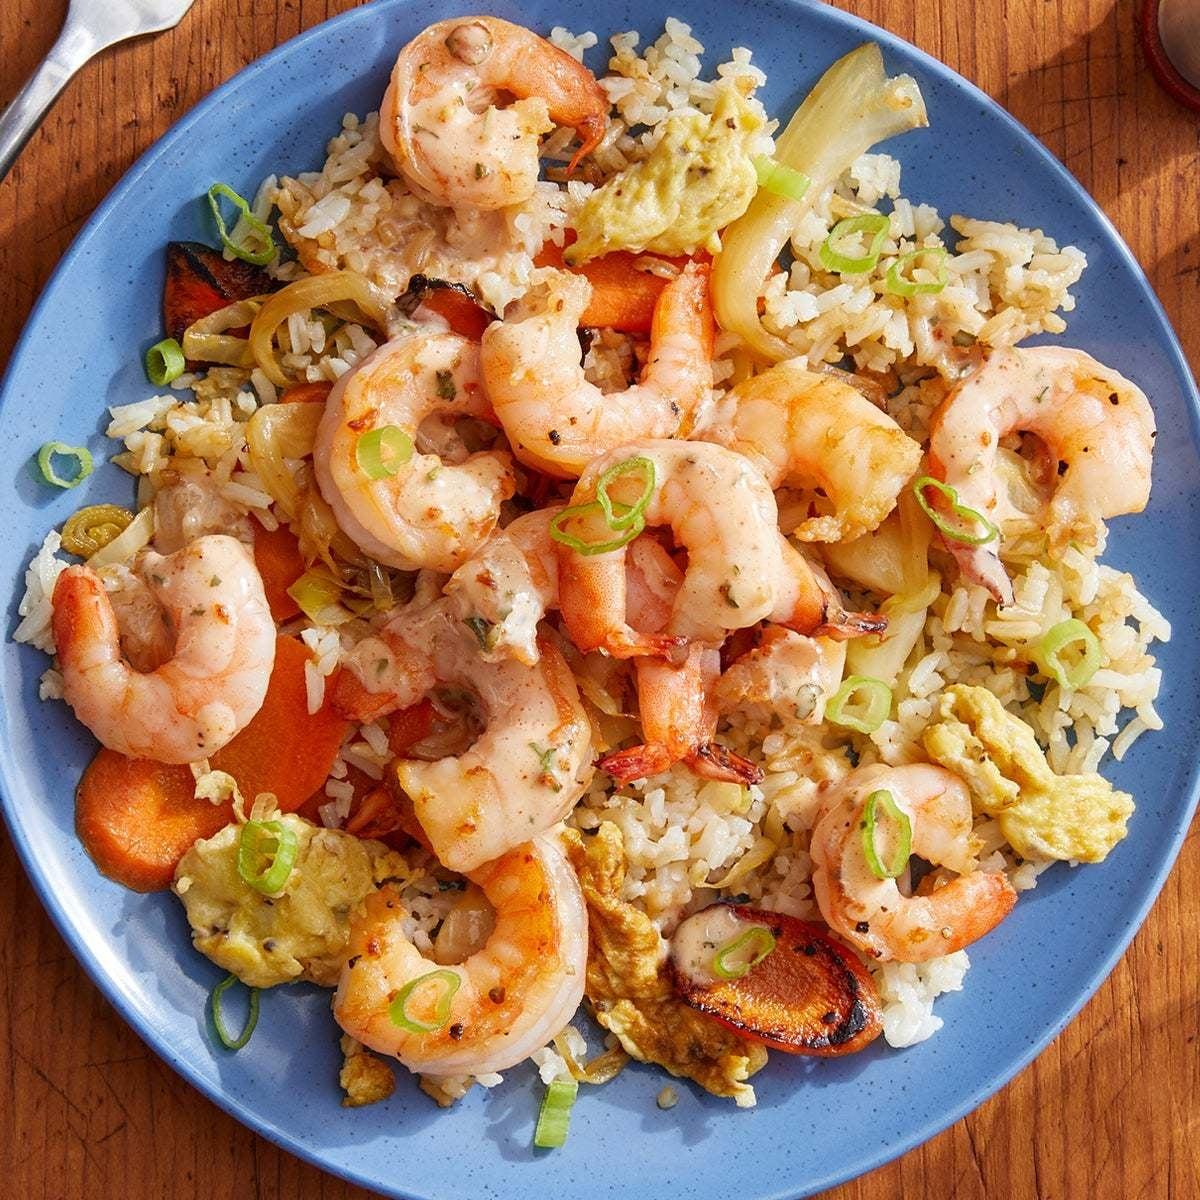 Hibachi-Style Shrimp Fried Rice with Spiced Mayo